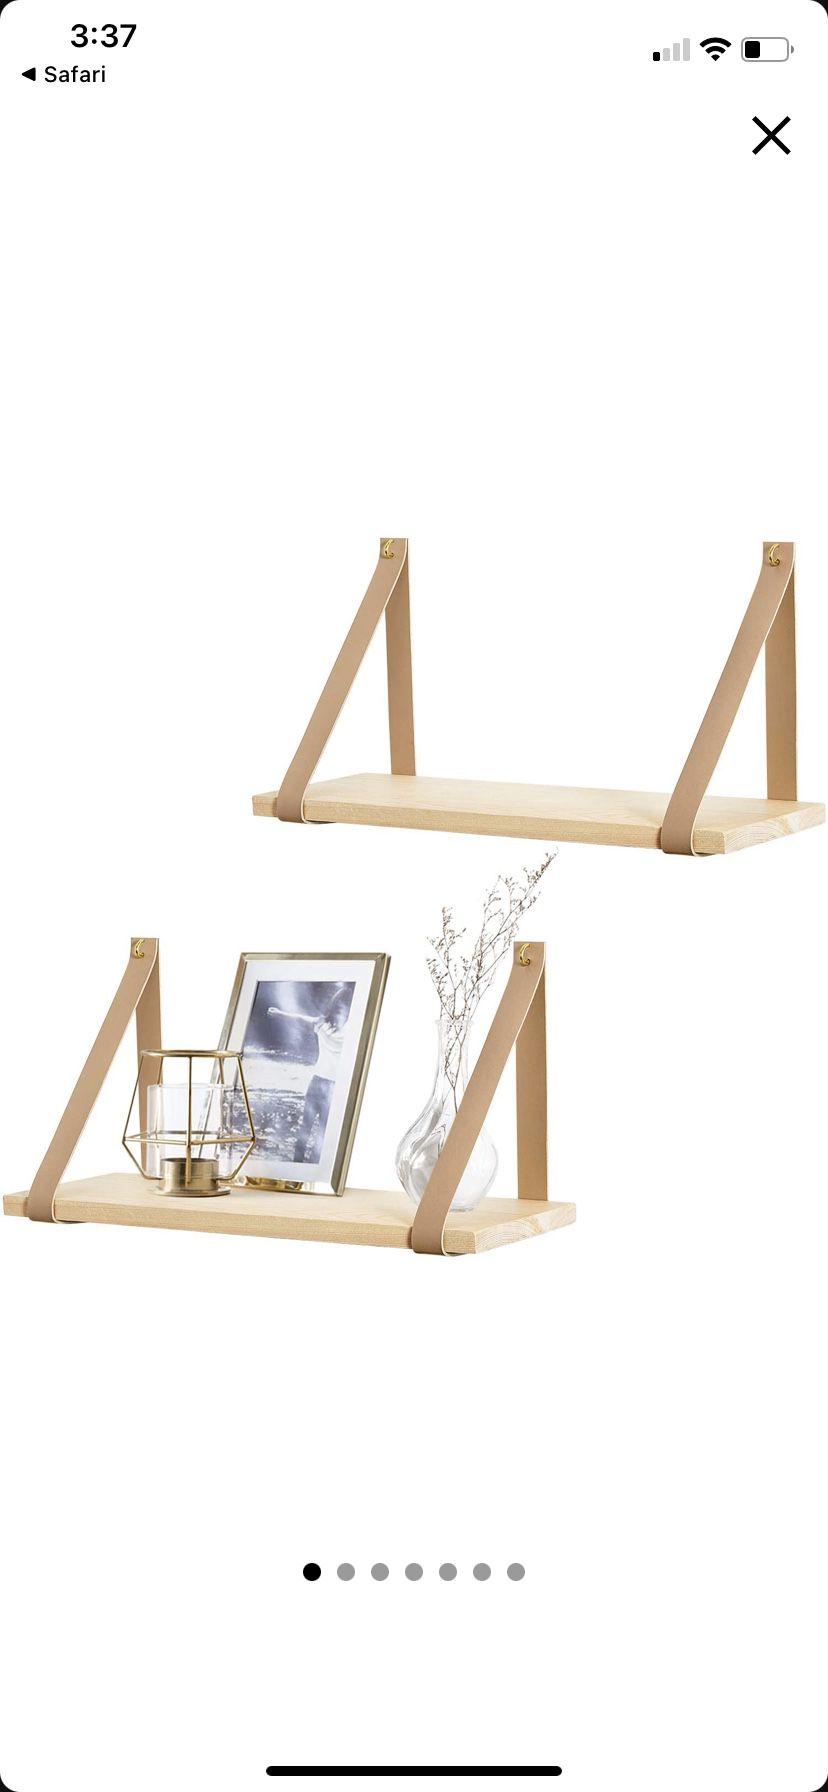 Mkono Hanging Shelf Wall Wood Floating Storage Shelves Leather Strap Swing Organizer